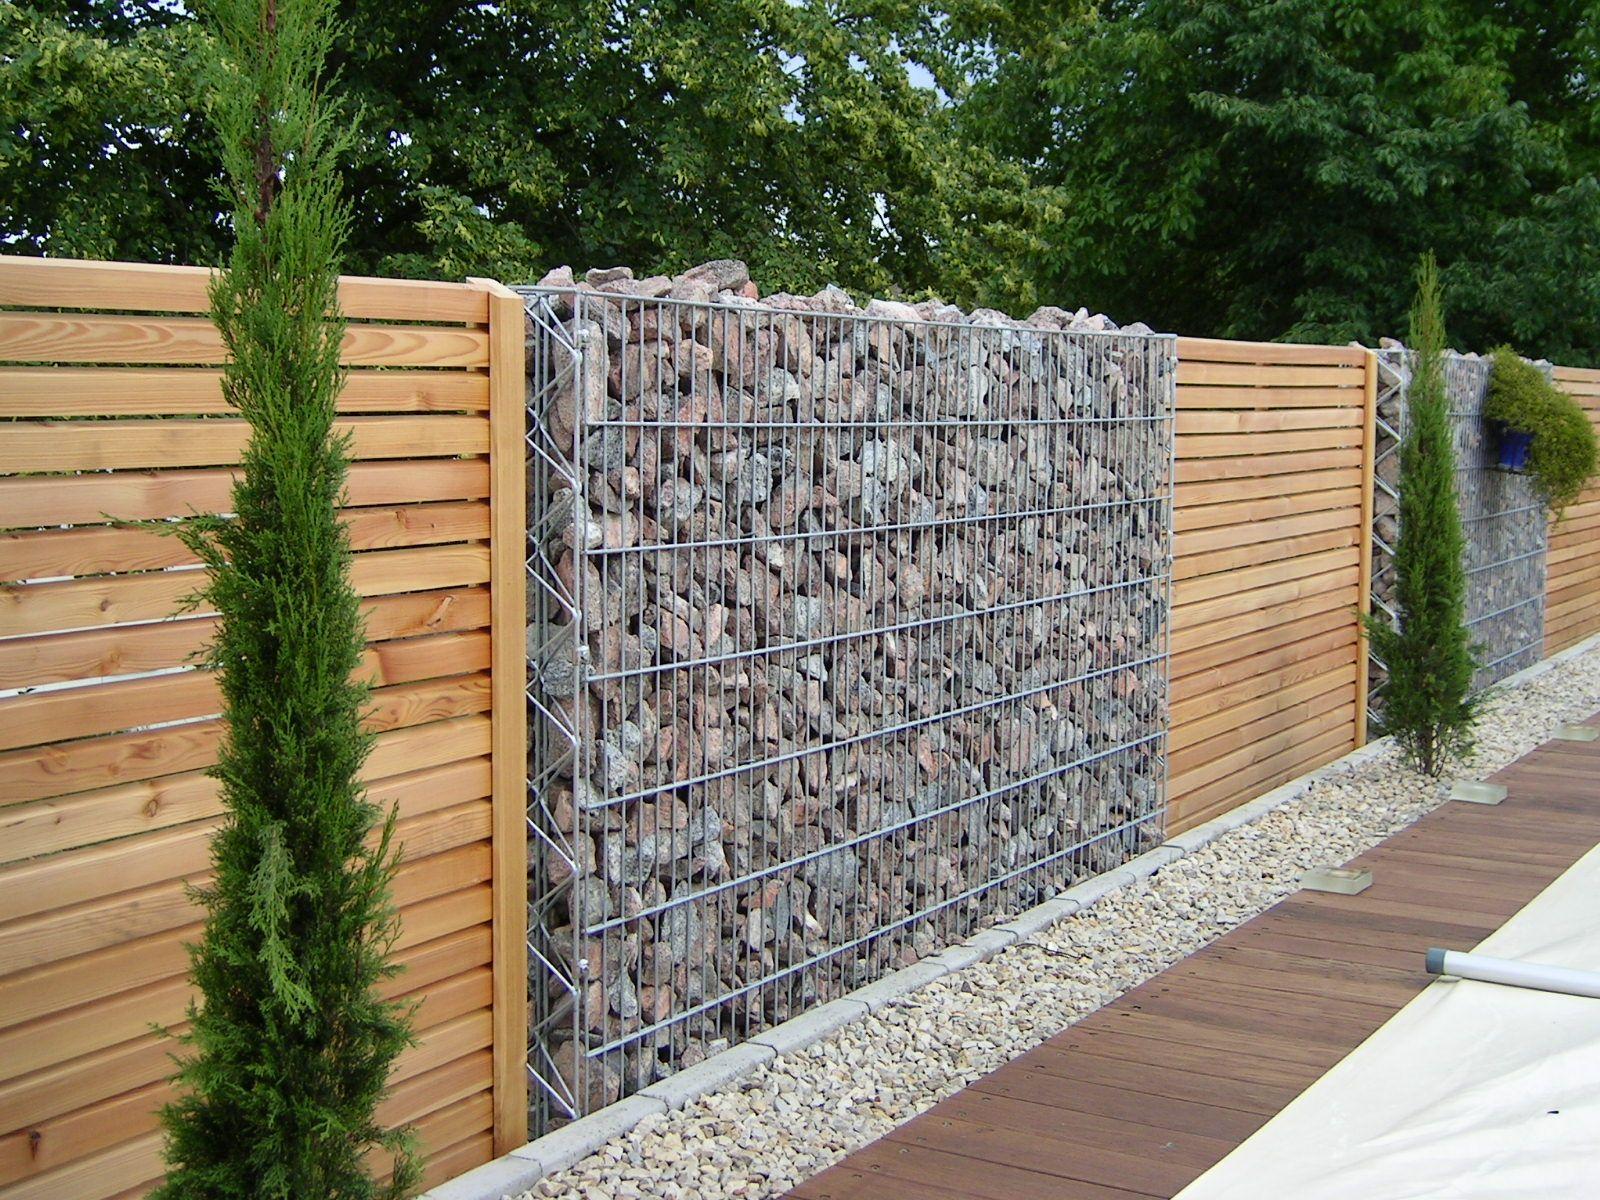 Gabion Wall | Jardineria | Cloture Jardin, Jardins Et ... pour Separation De Jardin